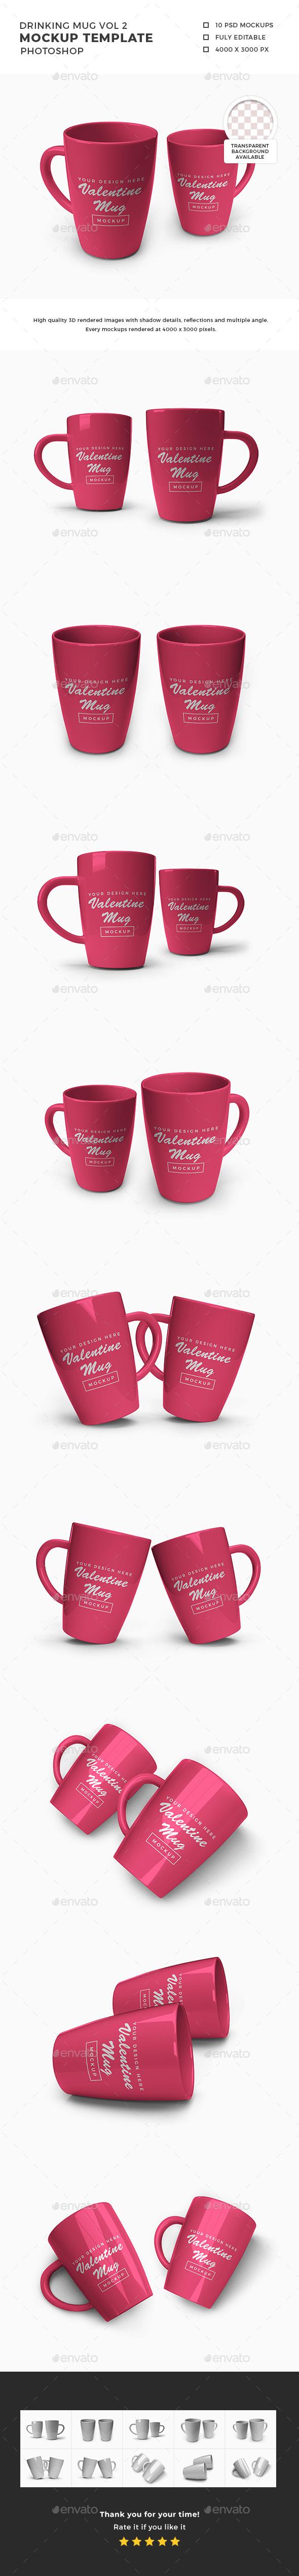 Drinking Mug Mockup Template Vol 2